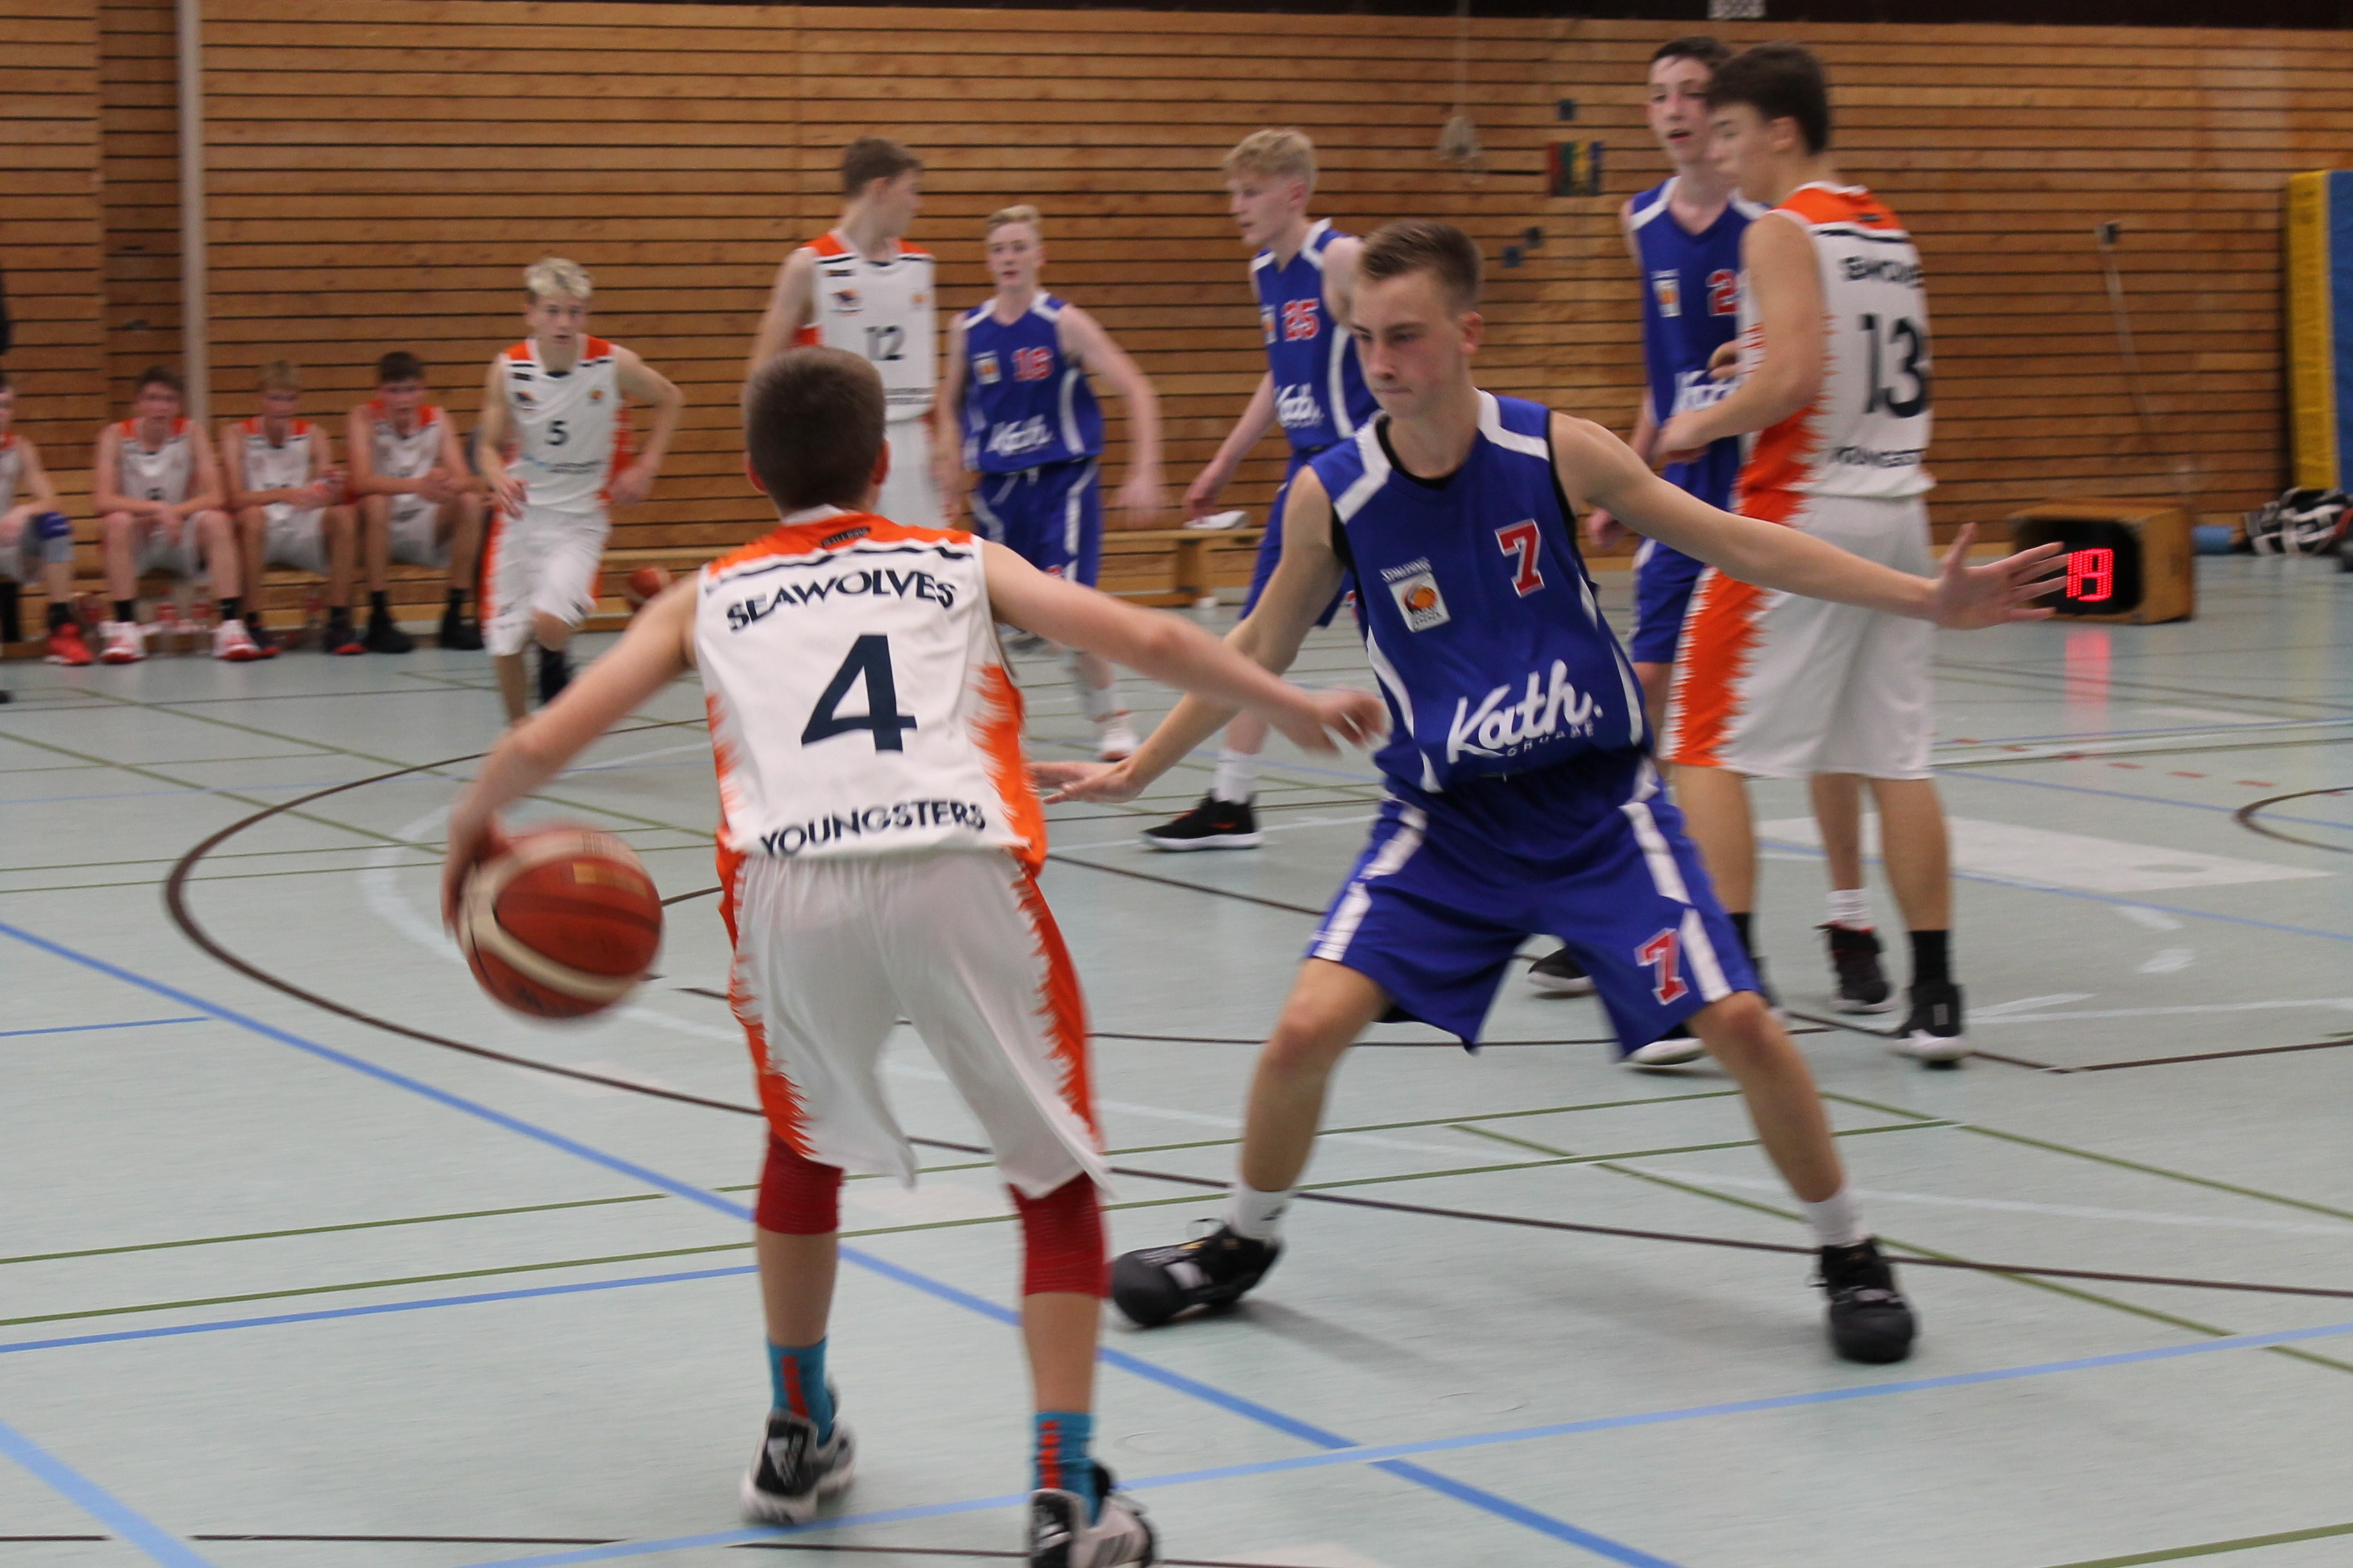 JBBL_19-20_BalticSeaLions_Rostock_Spieltag1_4_krupnikas_philipp7